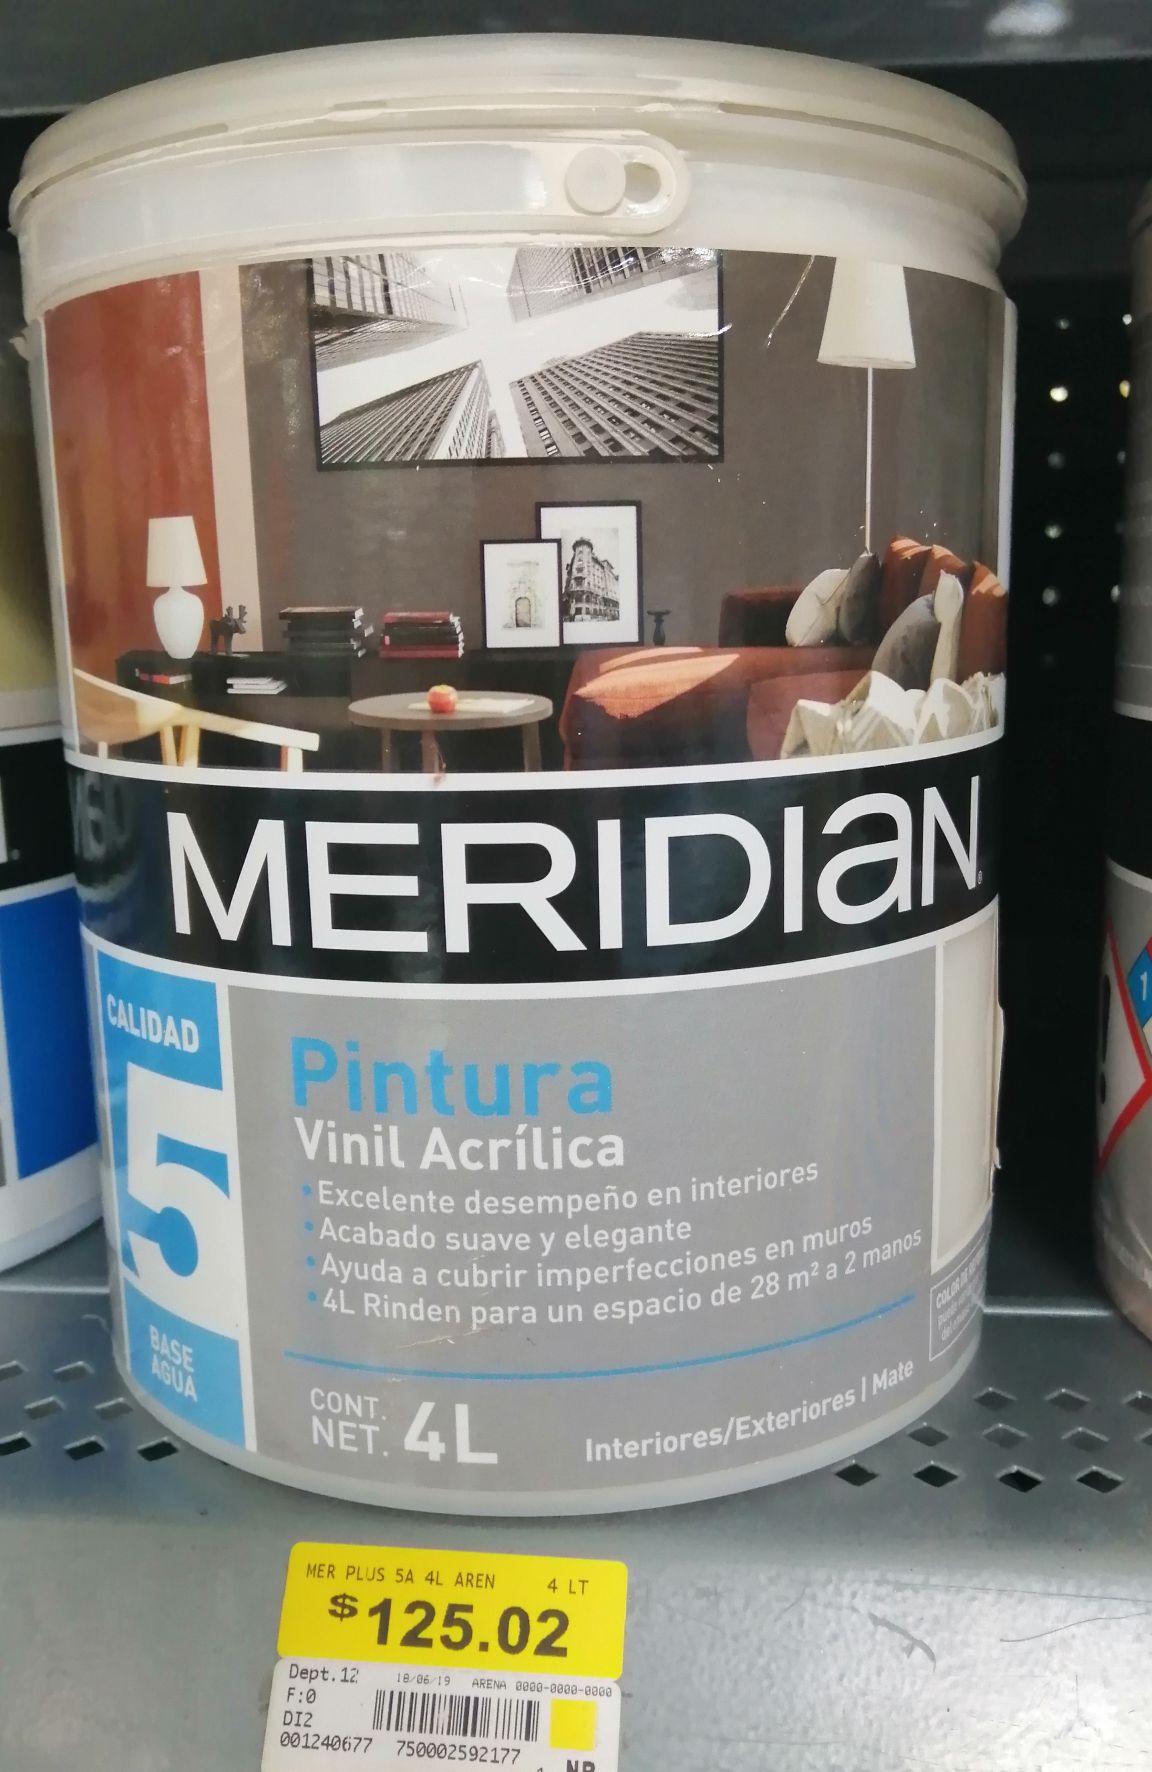 Bodega Aurrerá:  Pintura calidad plus (5) Meridian